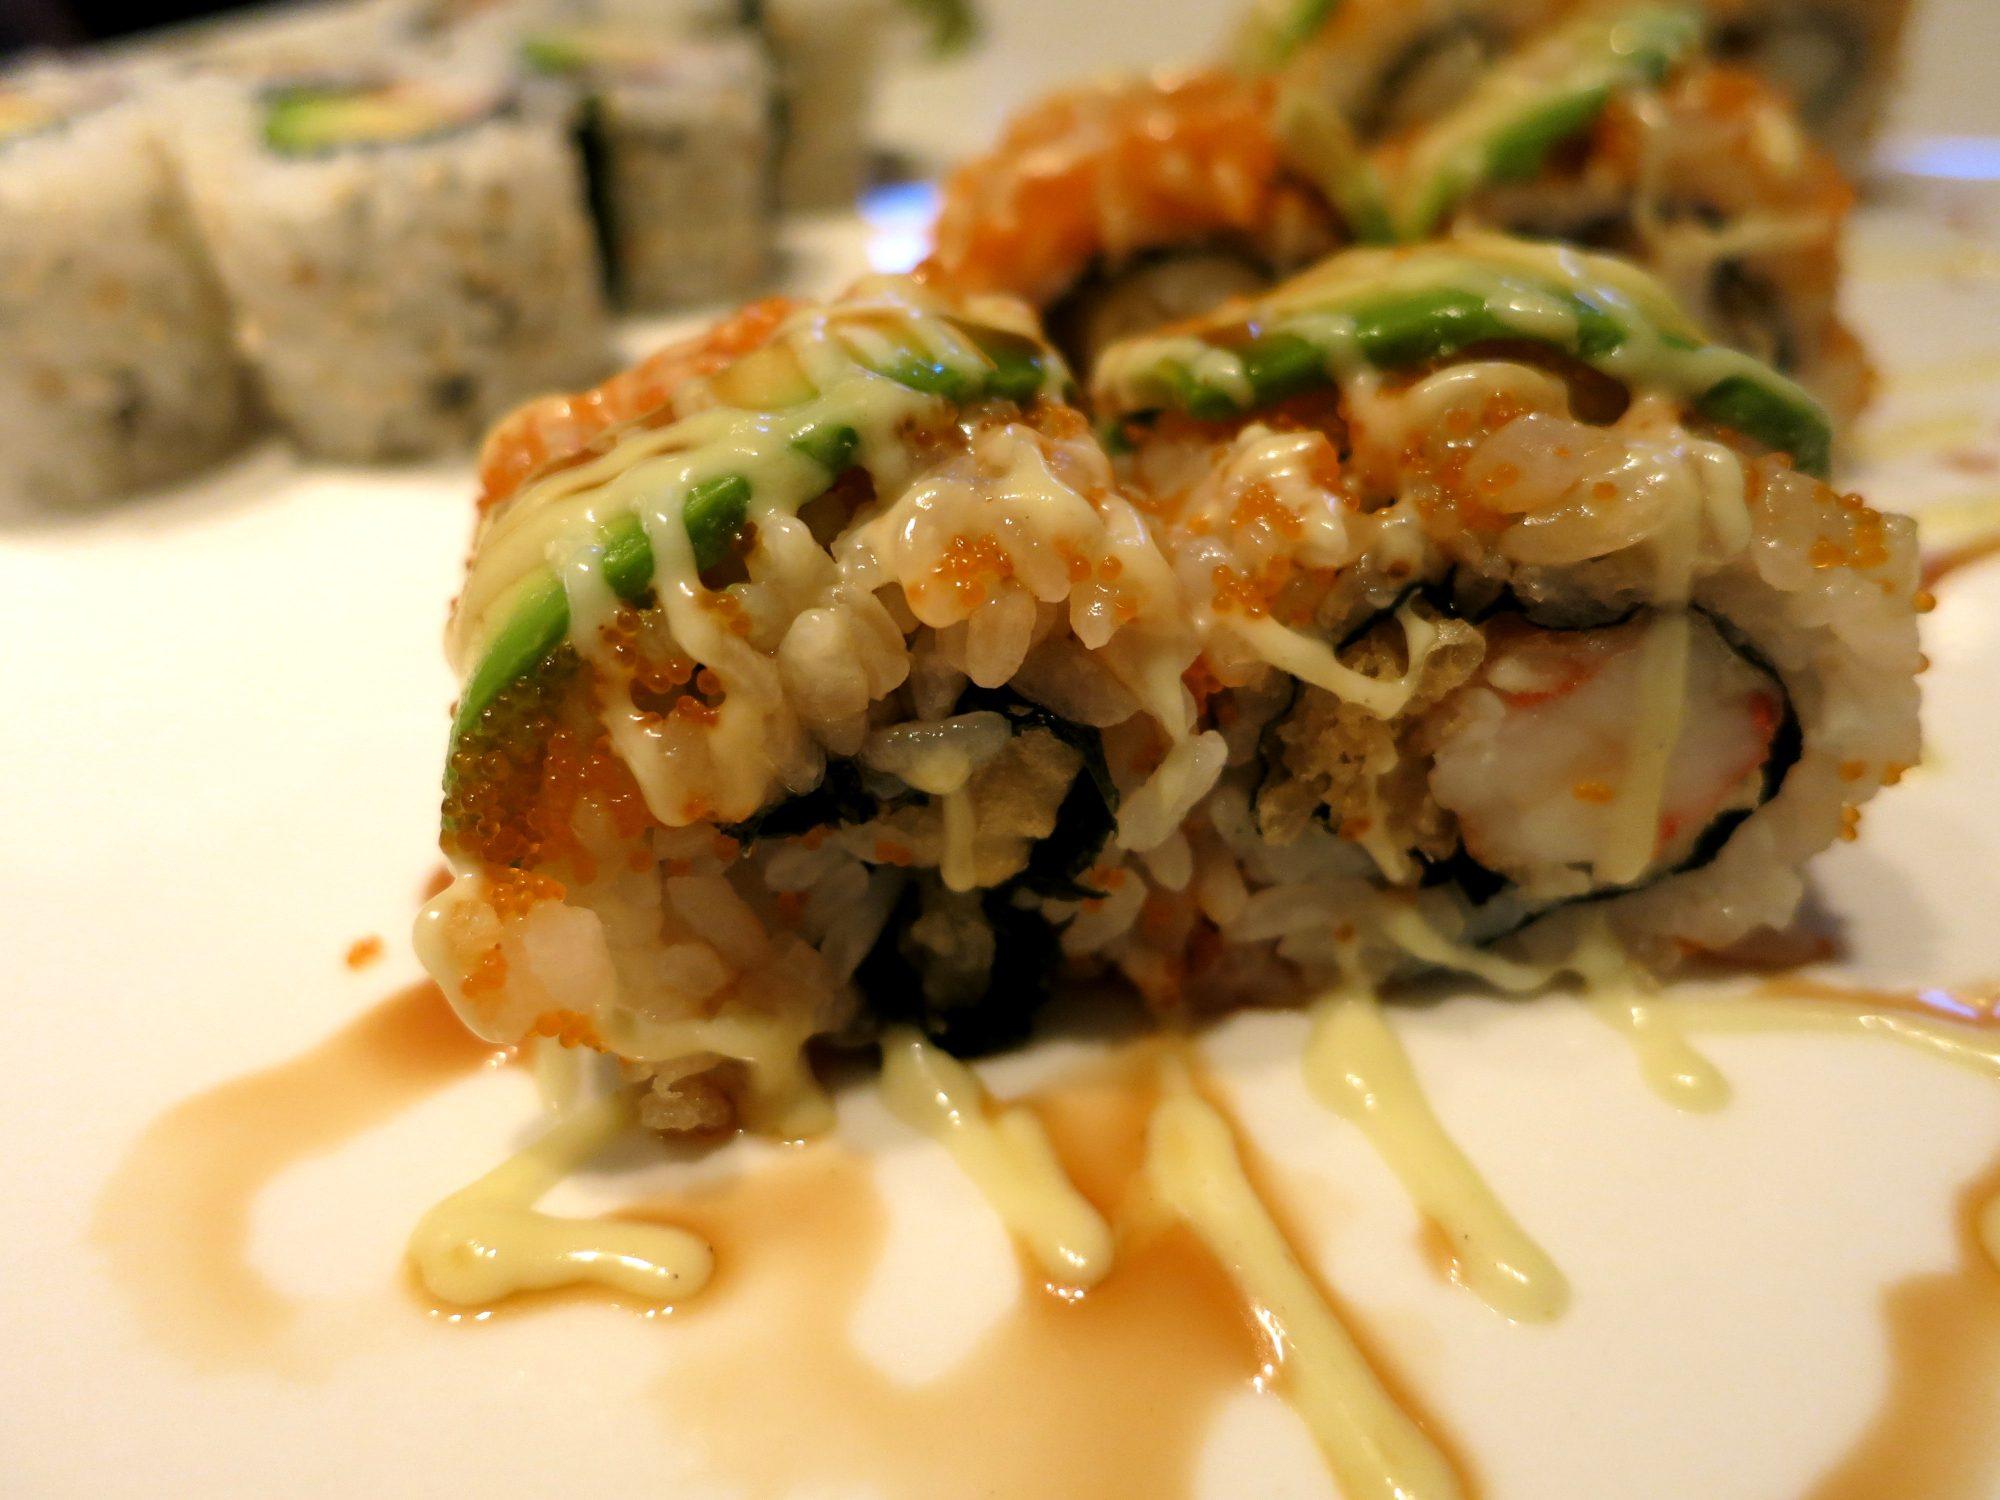 Akitsu may be the best sushi in Amsterdam. We sampled sashimi, sushi rolls and small dishes including the agedashi tofu and gyoza.